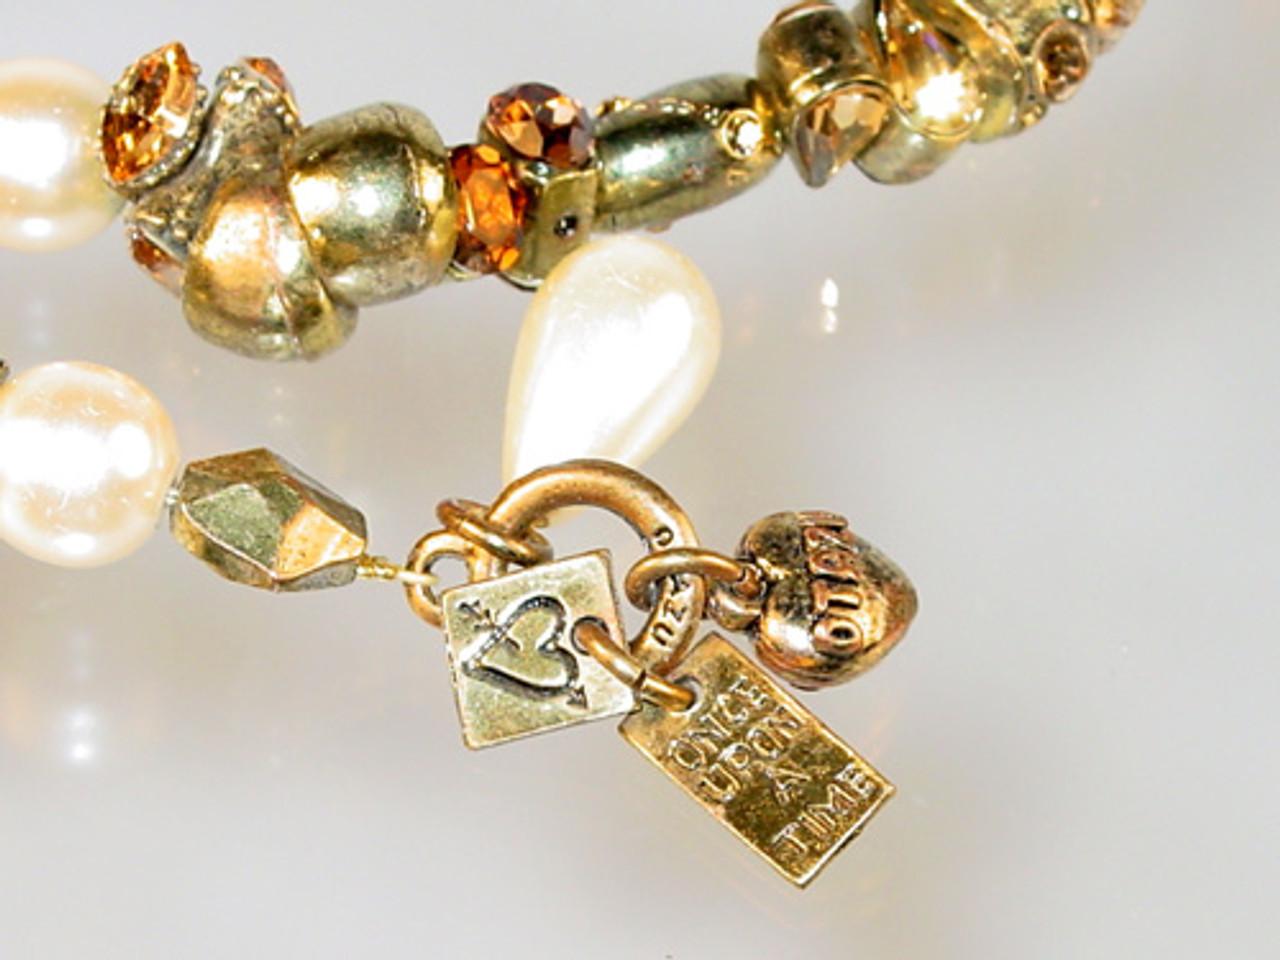 Otazu bracelet close